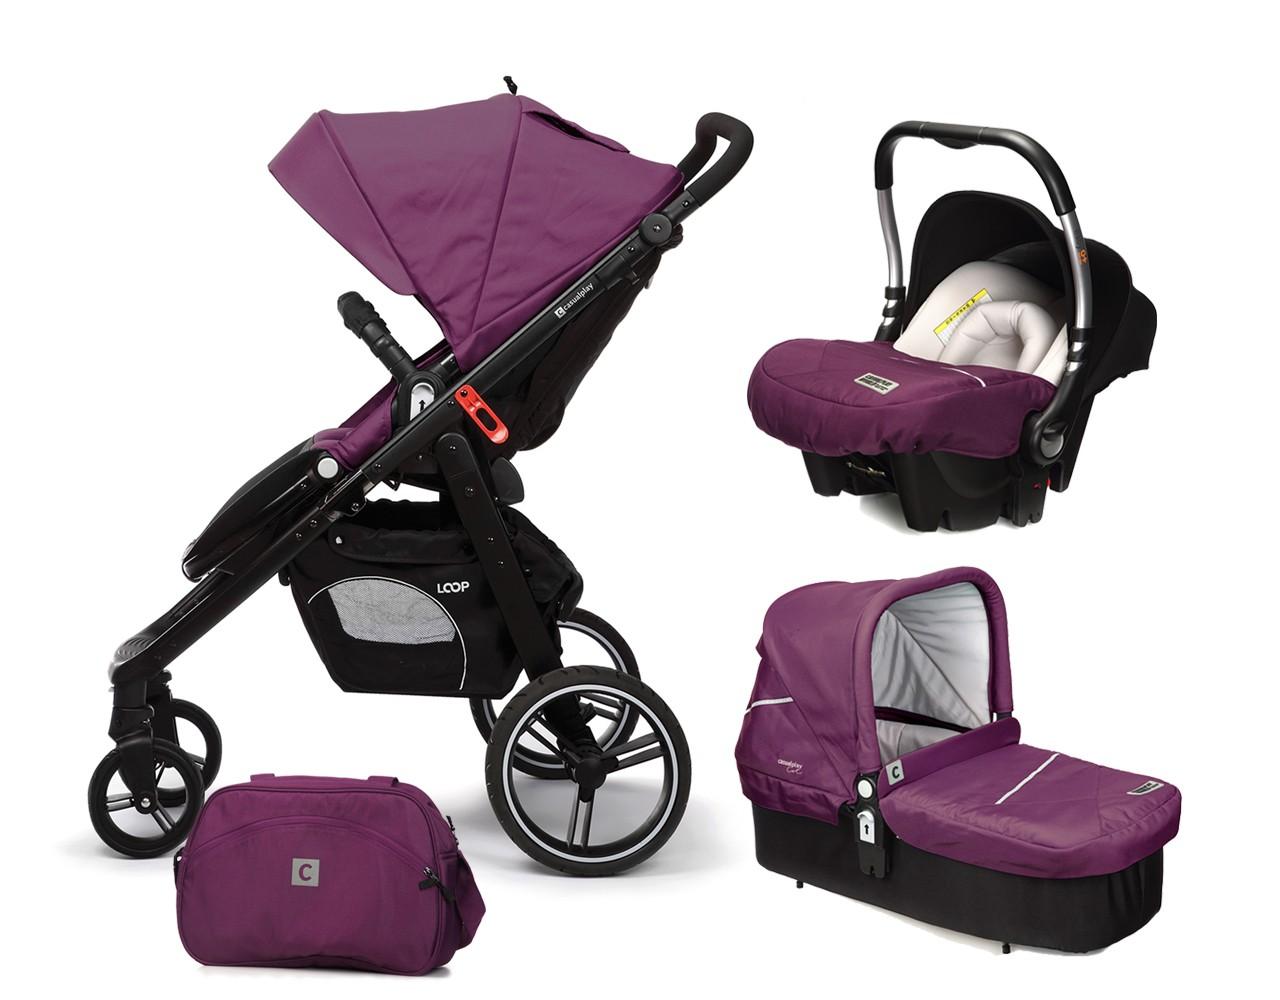 carritos de bebe 3 piezas baratos amazon